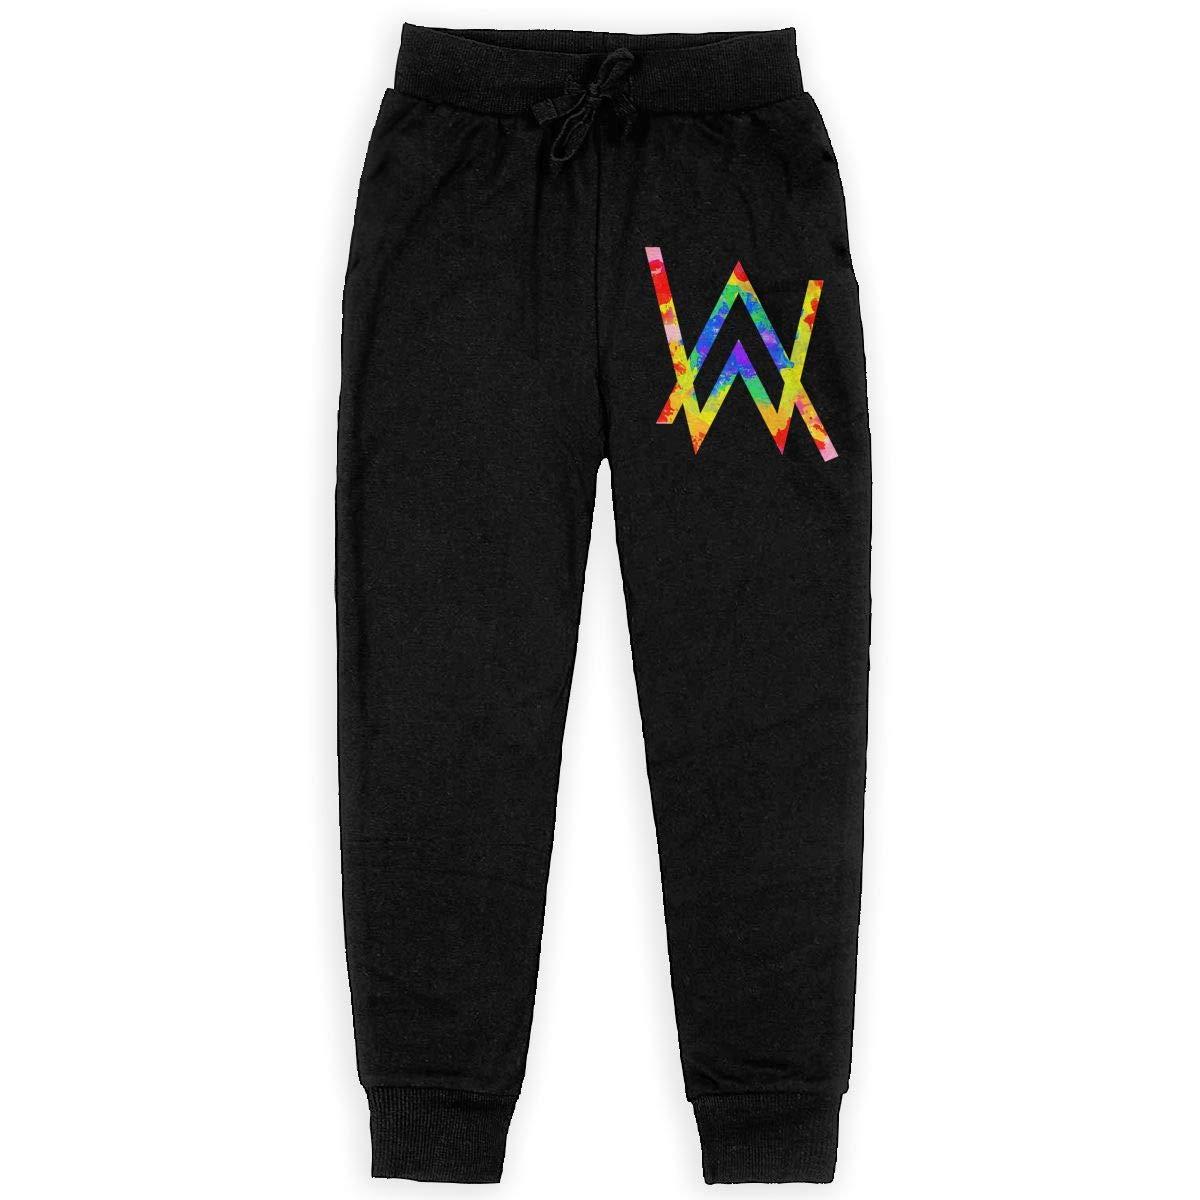 FROOLOCP Alan Walker Colorful Logo Girls Jogger Sweatpants Youth Joggers Sport Training Sweatpants